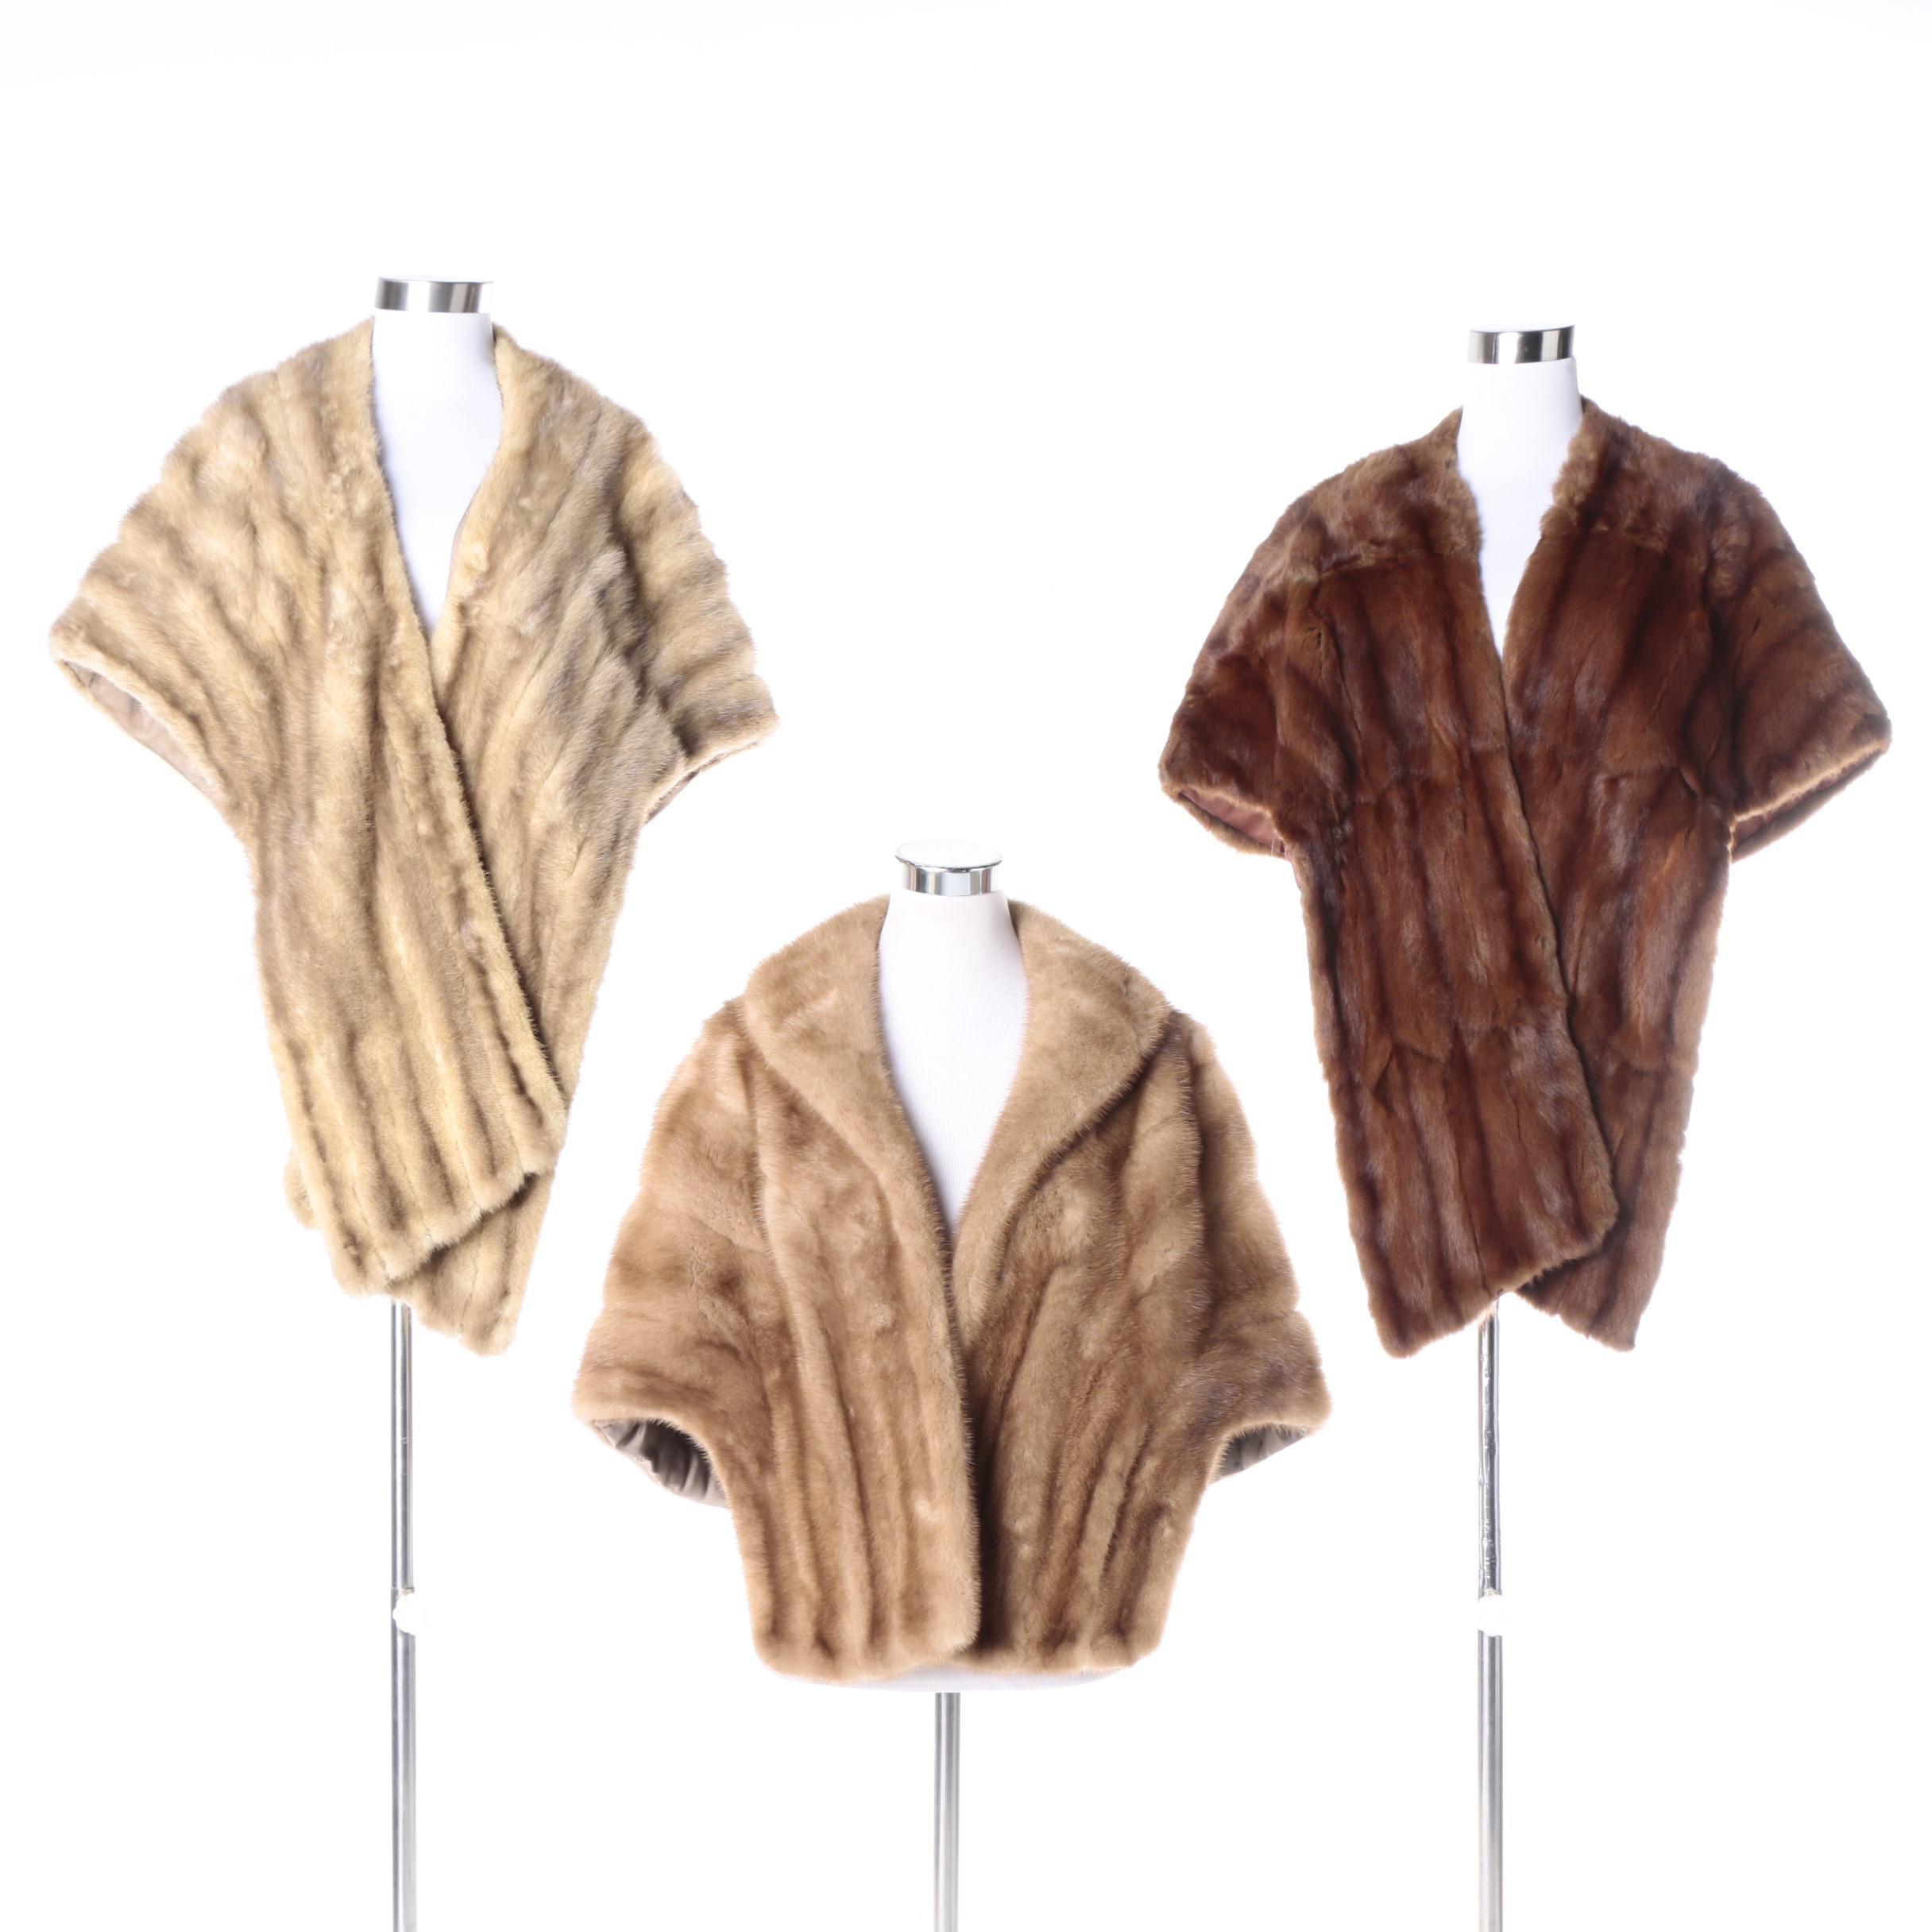 Three Vintage Mink and Squirrel Fur Stoles